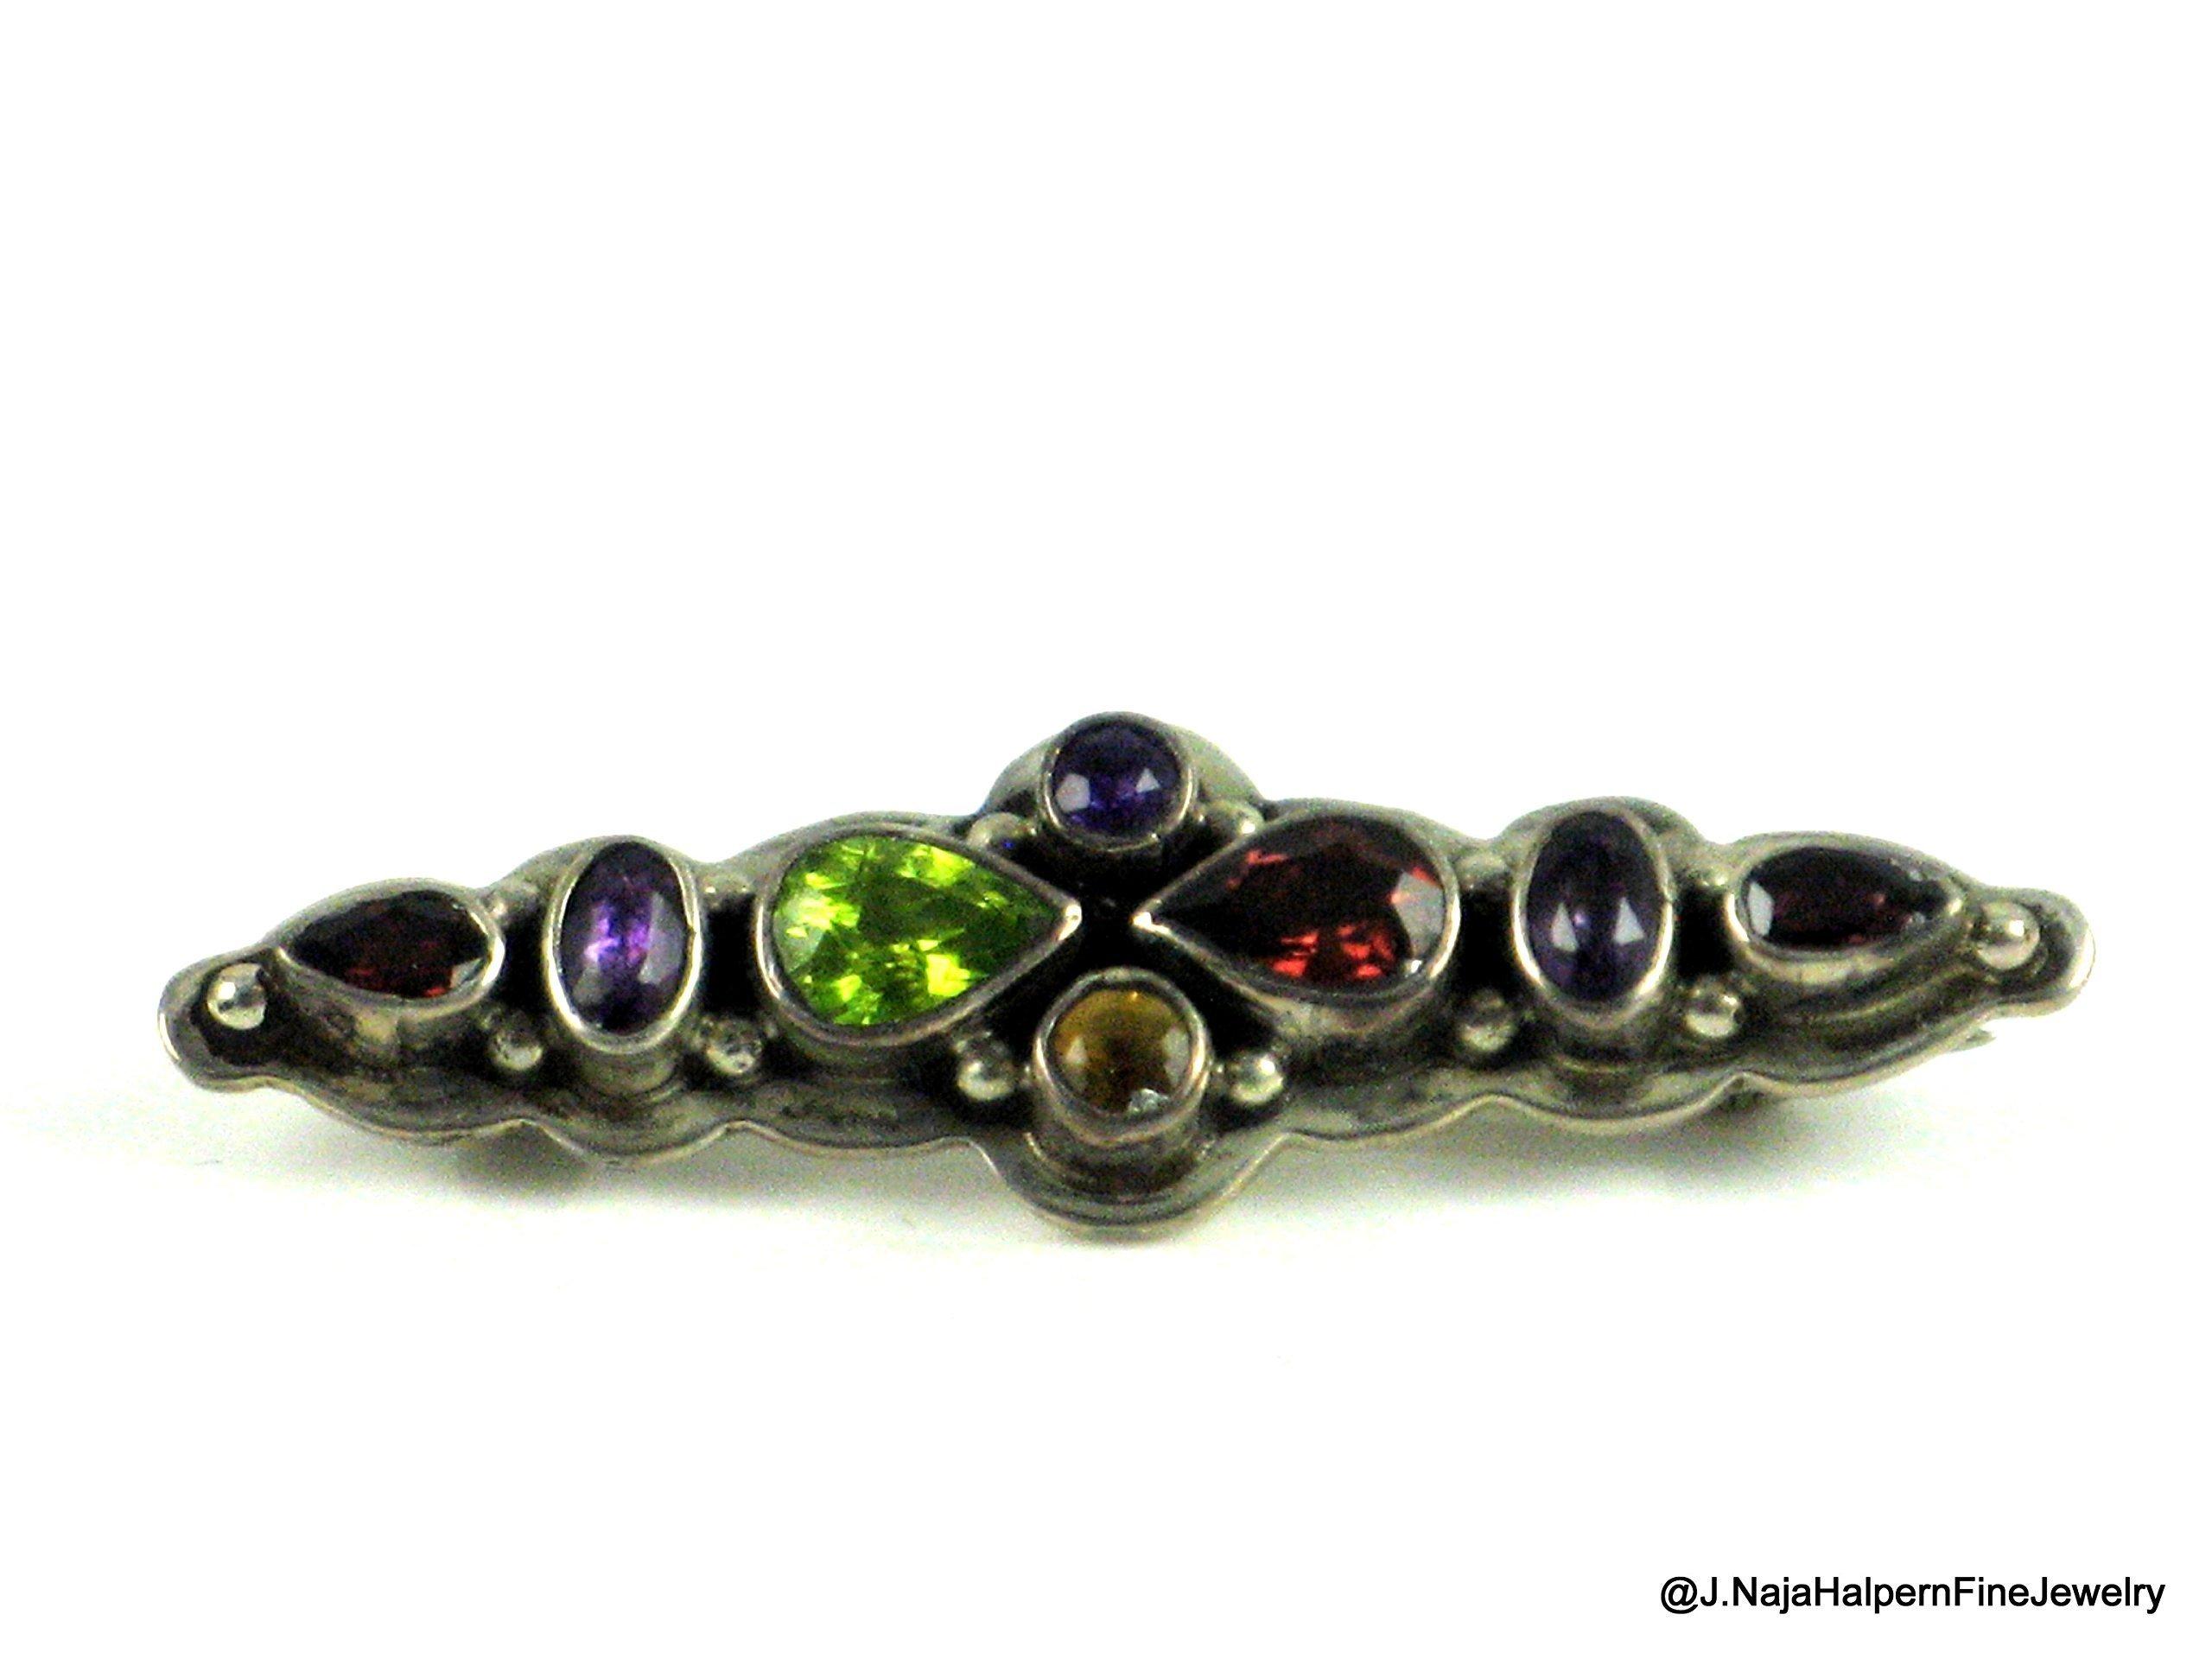 MULTI GEMSTONE PIN, STERLING SILVER PIN 925, of Super Quality Jewels, 2'' x 1/2'' TEN Gemstone Pin 925